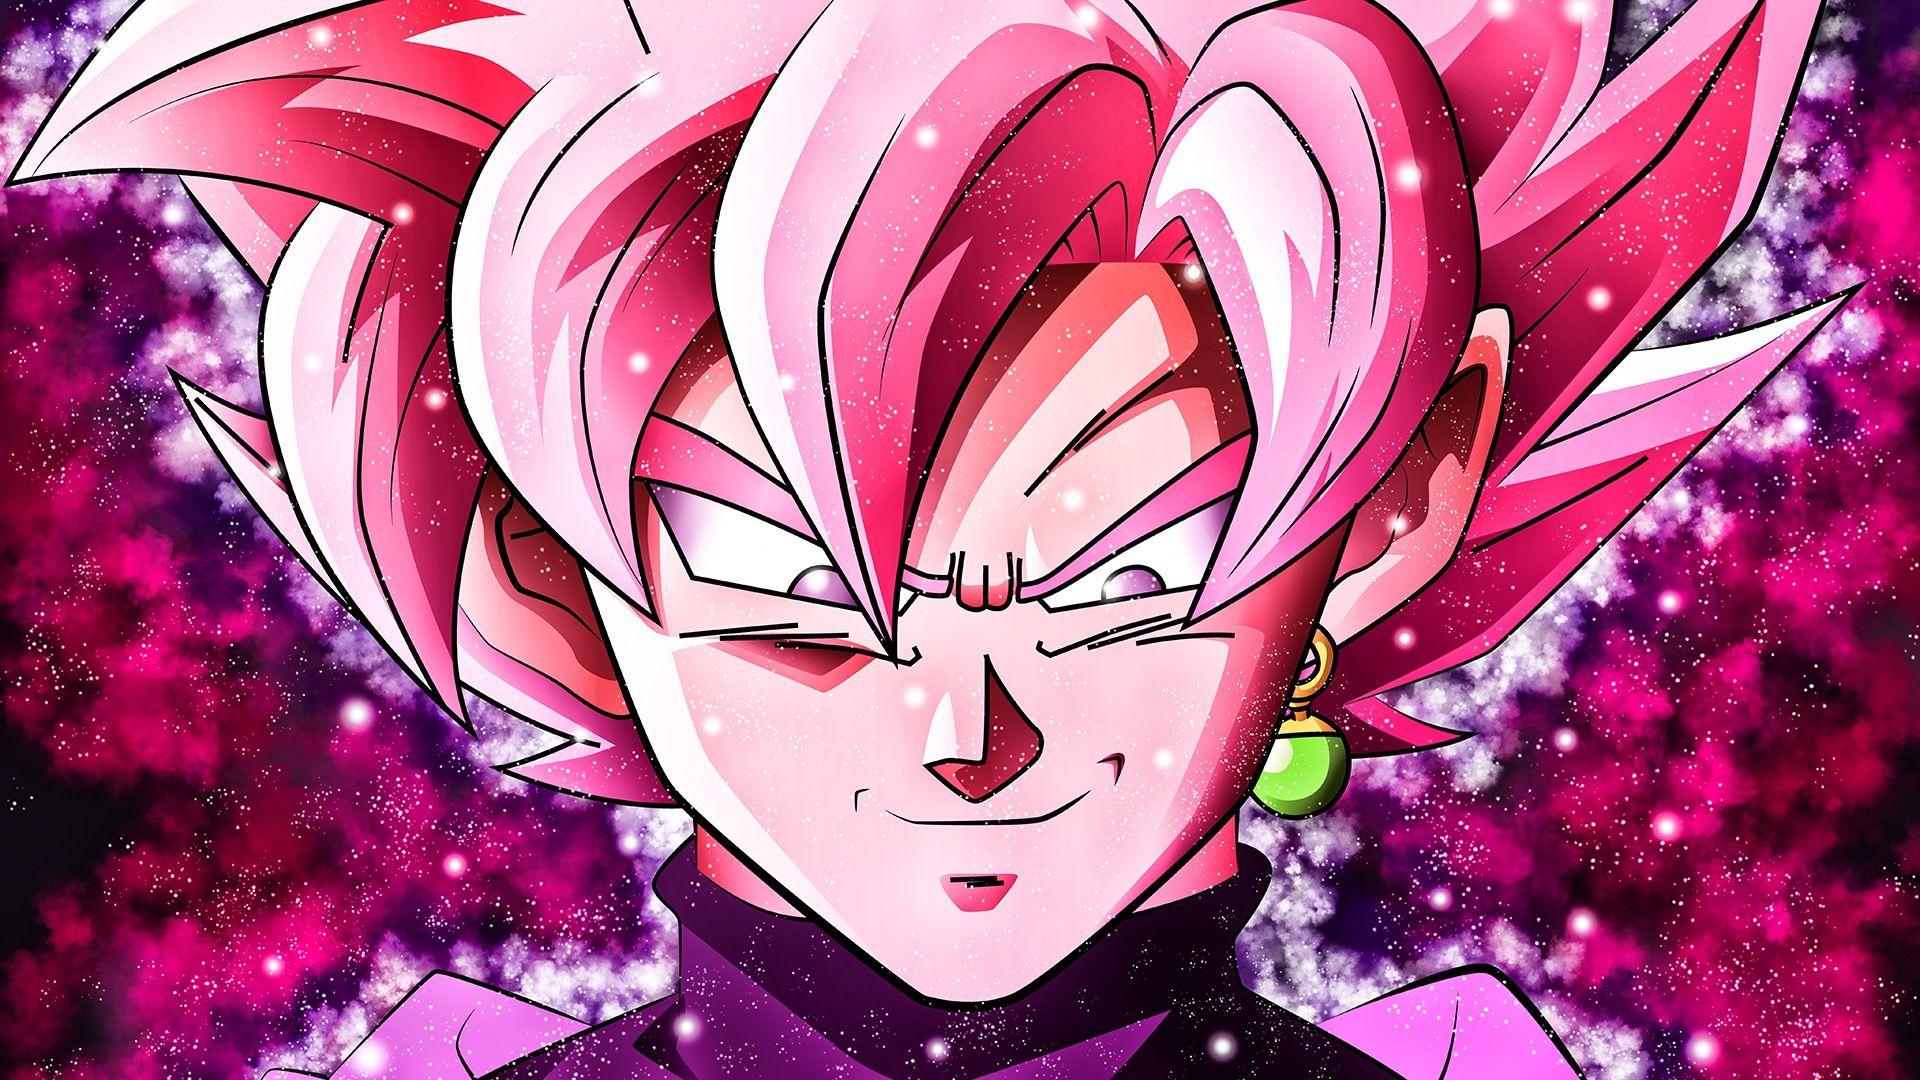 Goku Black Super Saiyan Rose Dbs Goku Wallpaper Goku Black Super Saiyan Super Saiyan Rose